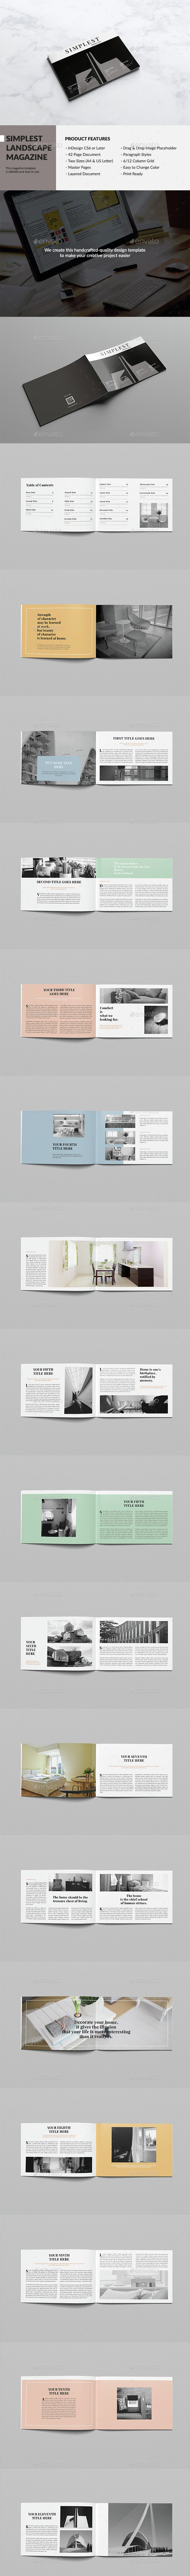 Simplest Landscape Magazine - Magazines Print Templates